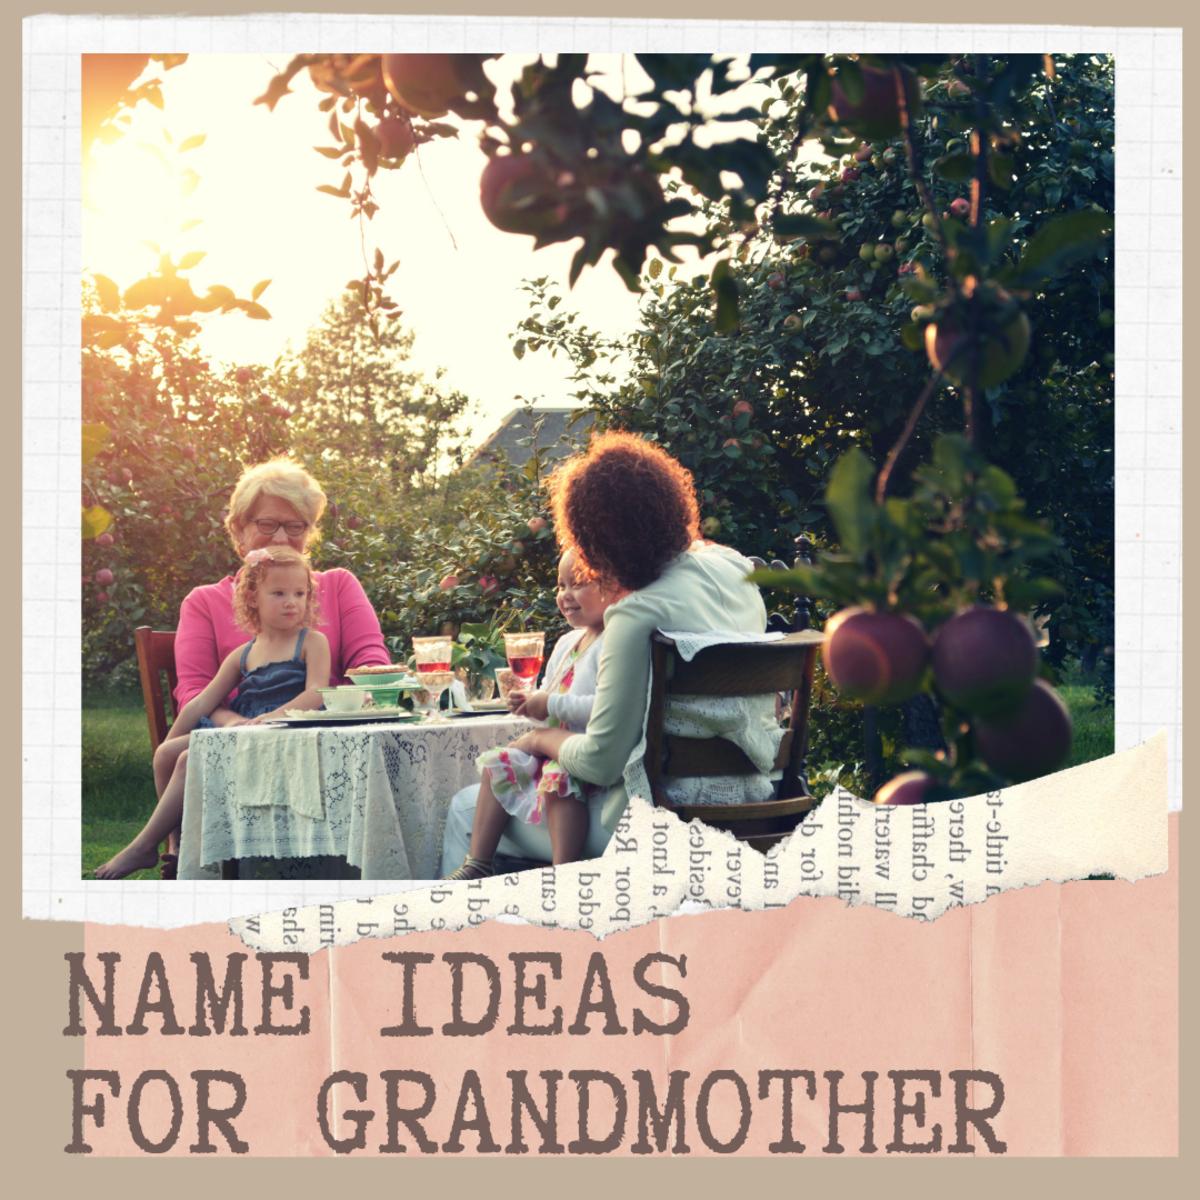 Altnernative Name Ideas for Grandmother